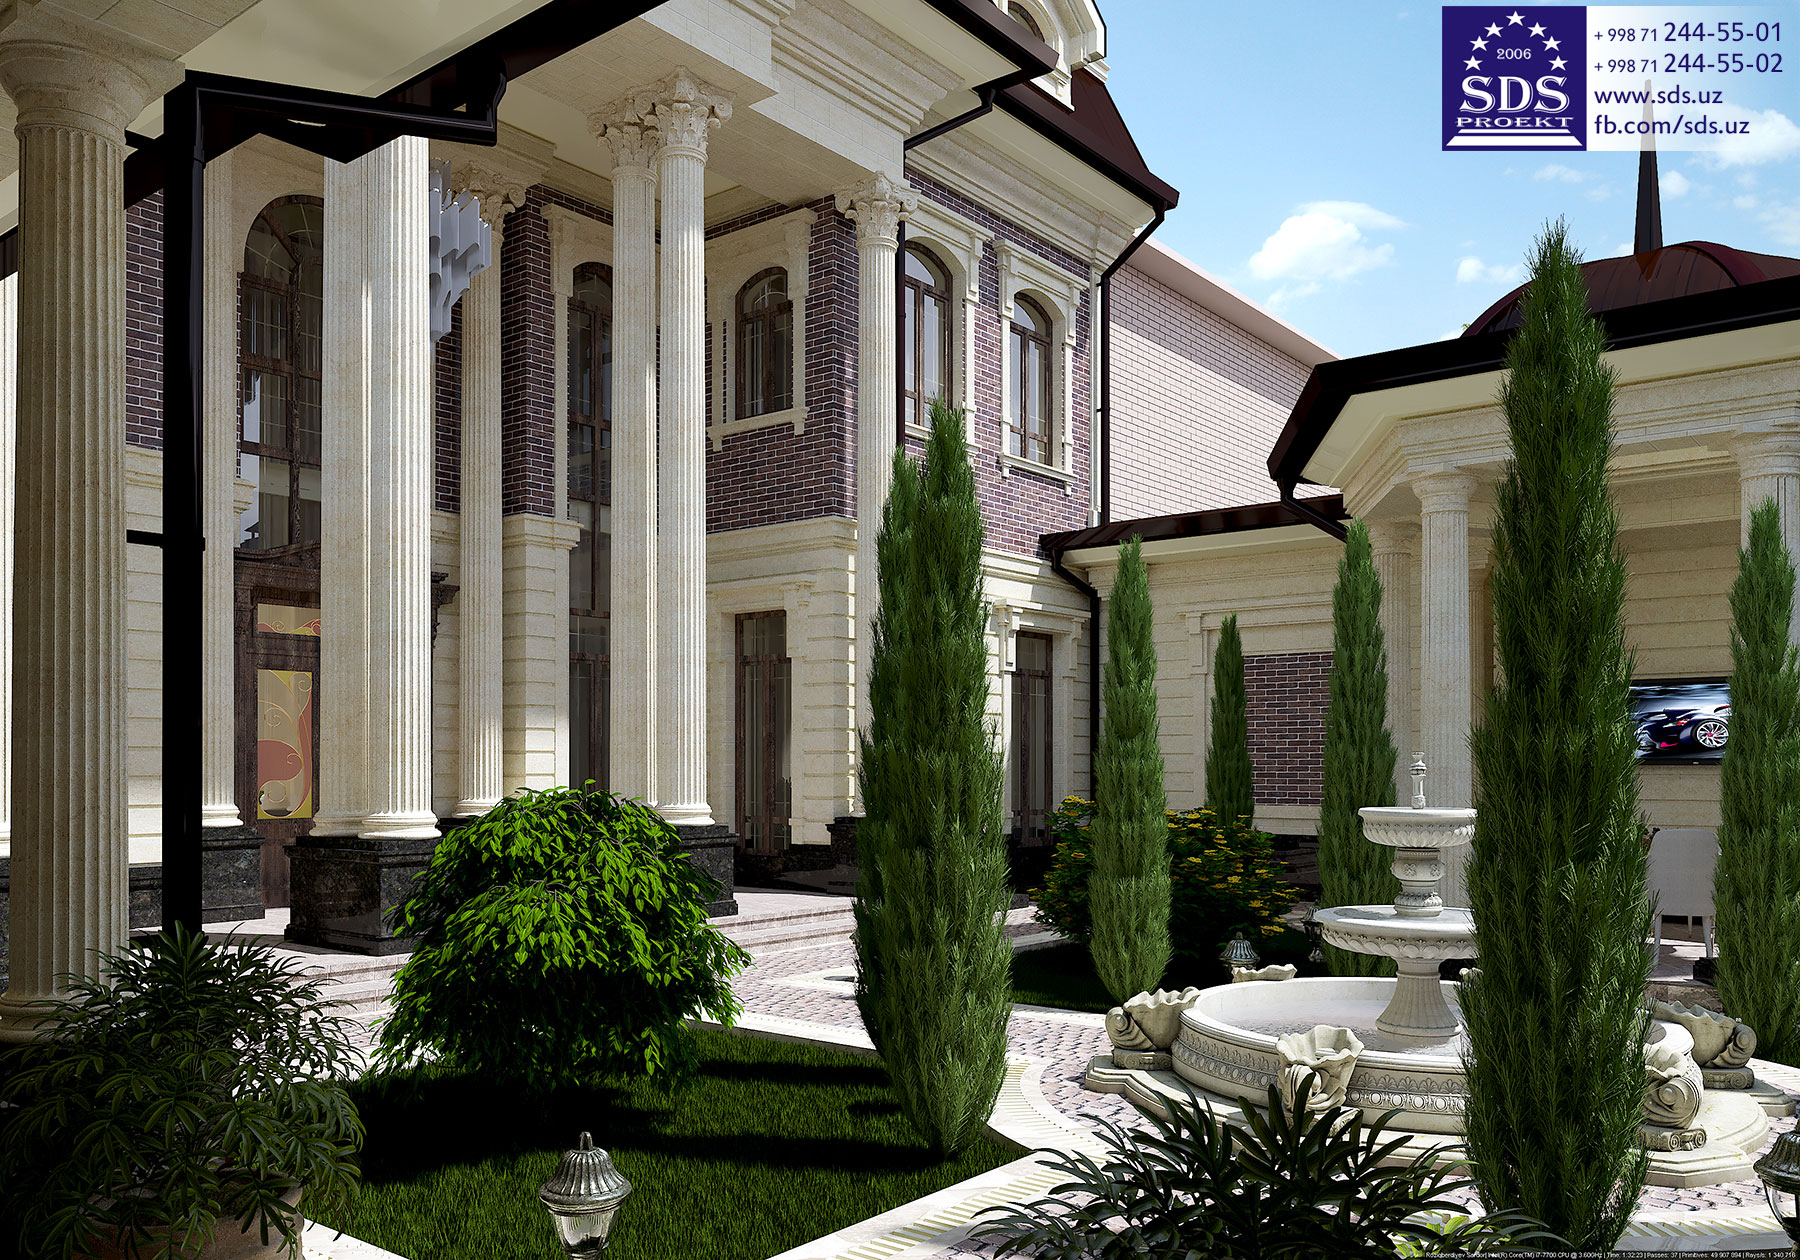 Проект двухэтажного частного дома на ул. Ахунбабаева